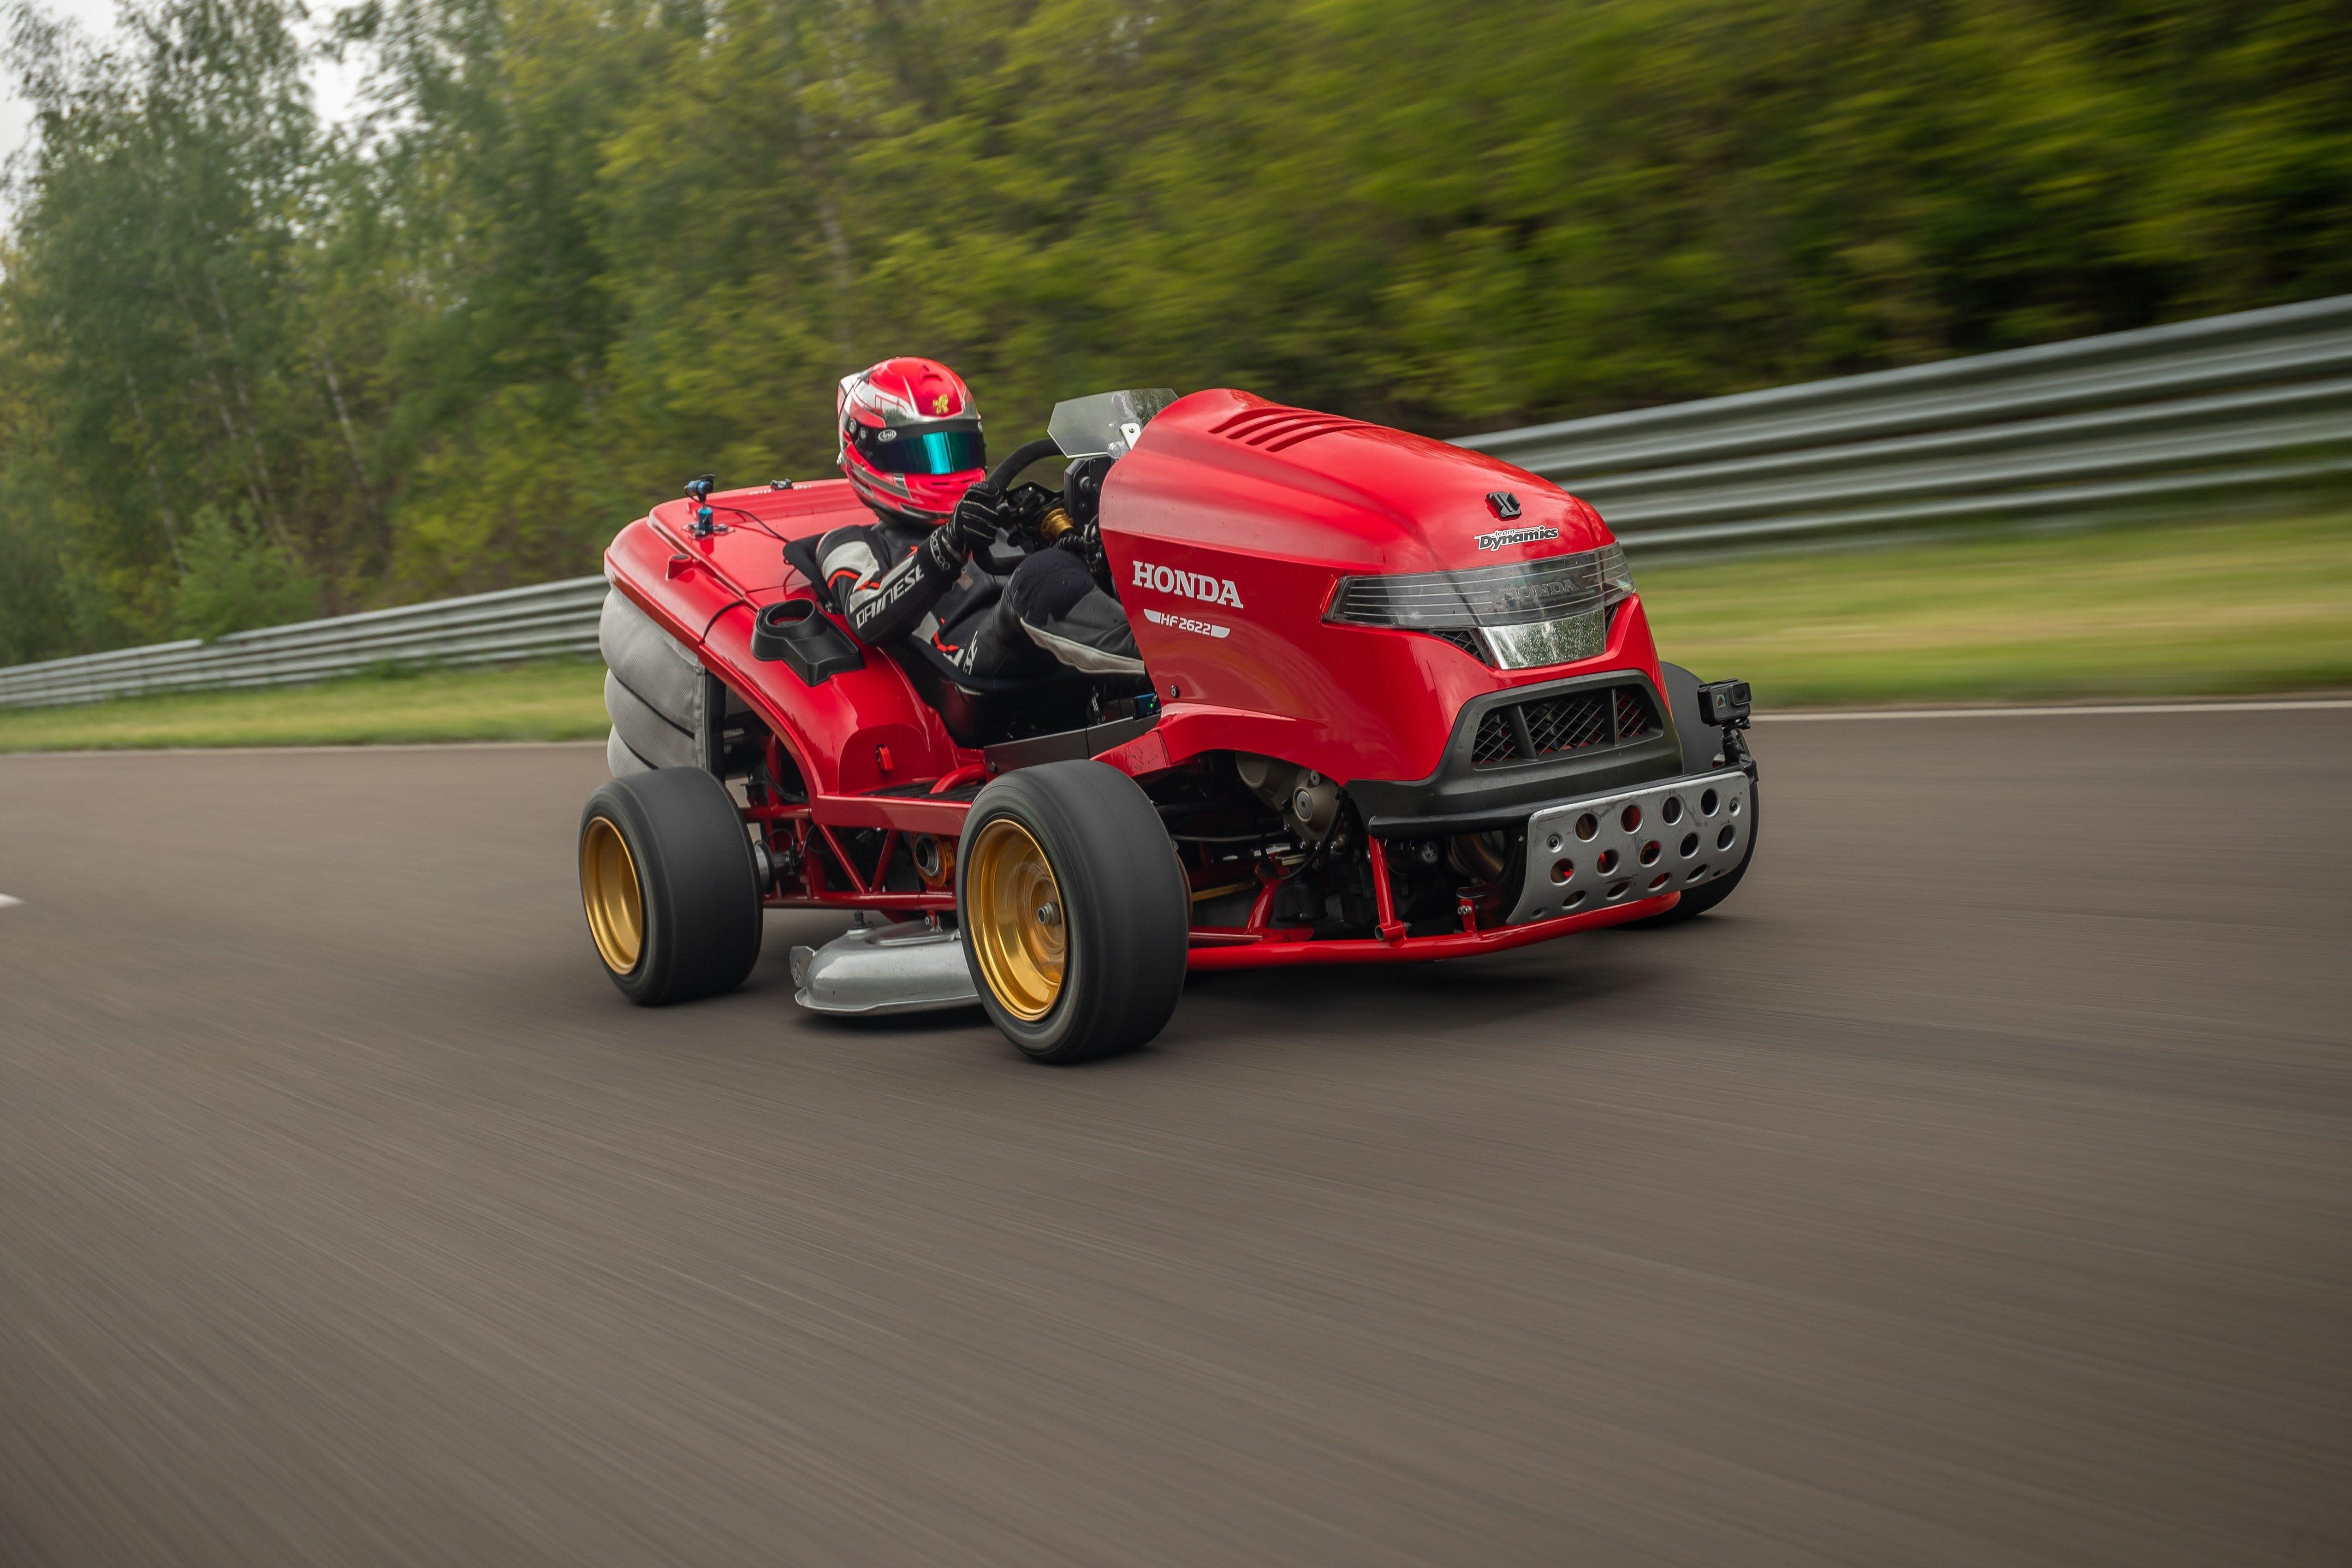 Lean, mean, grass-cutting machine: Honda breaks record for fastest lawnmower acceleration